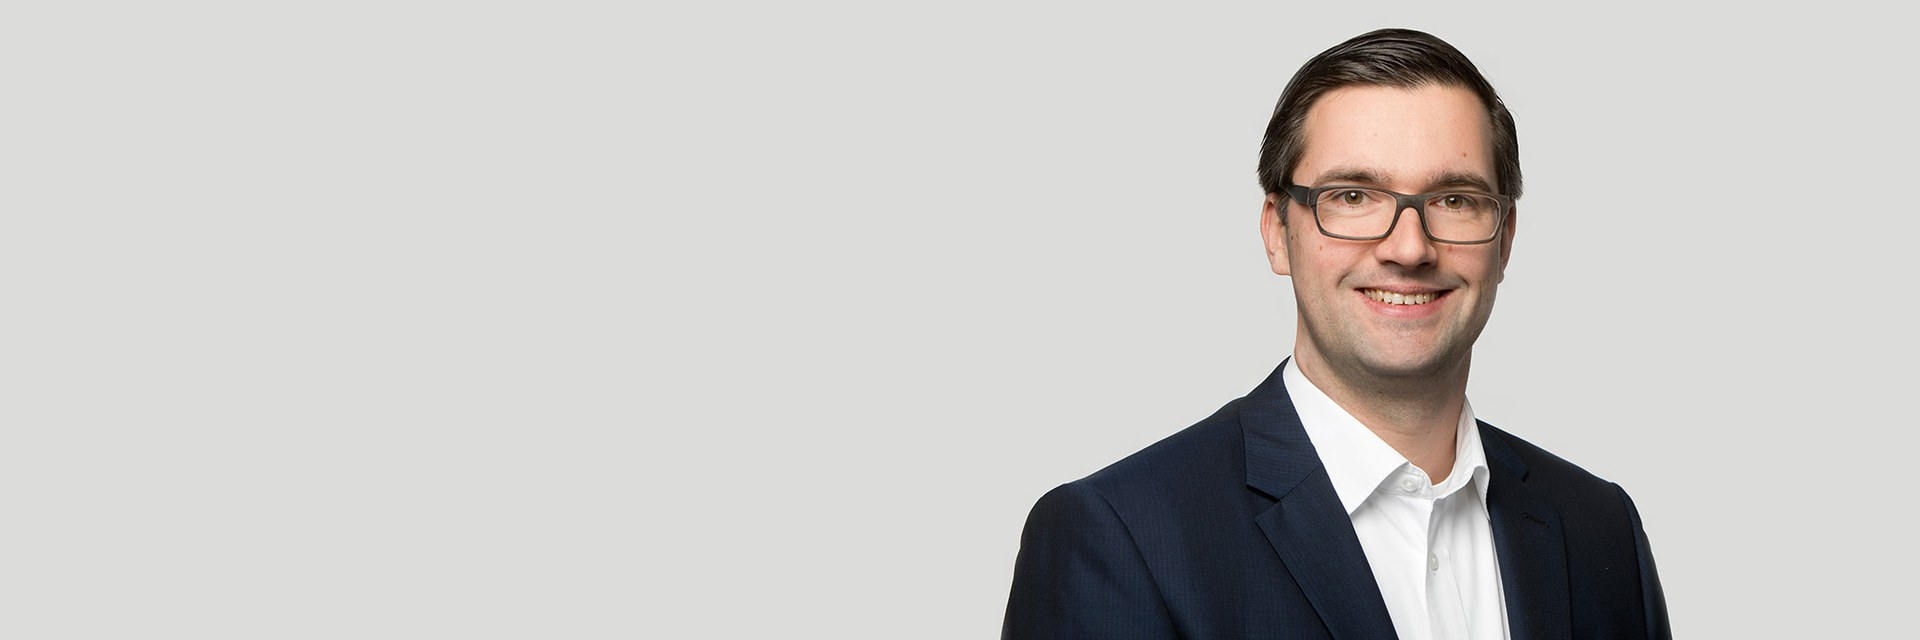 Pascal Segginger, Betriebsökonom FH